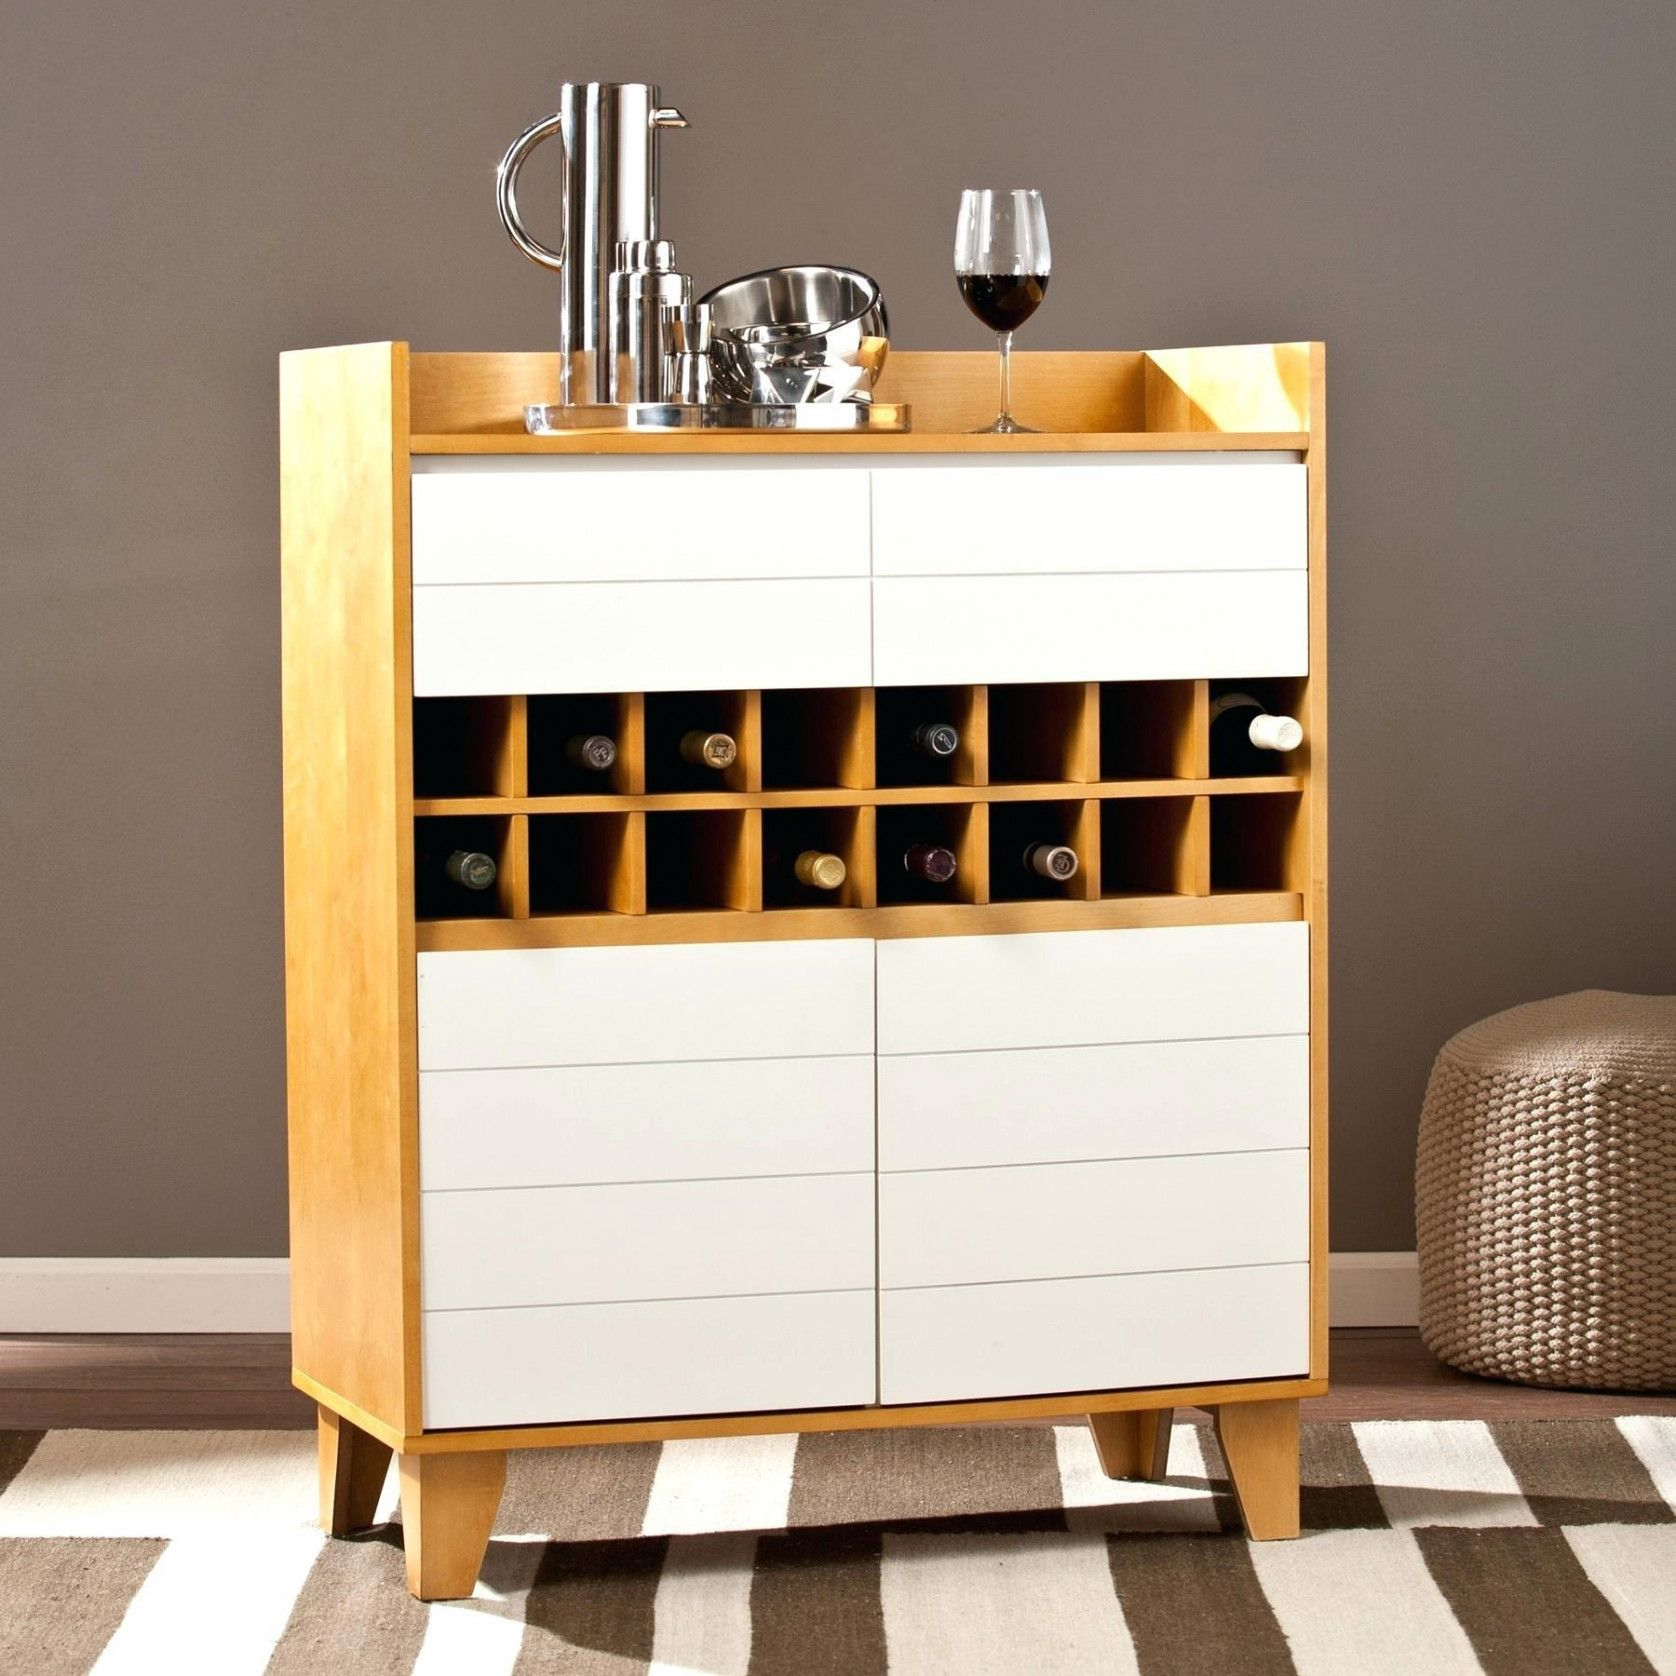 2018 Wine Storage Cabinets Uk - Kitchen island Countertop Ideas Check more at / & 2018 Wine Storage Cabinets Uk - Kitchen island Countertop Ideas ...